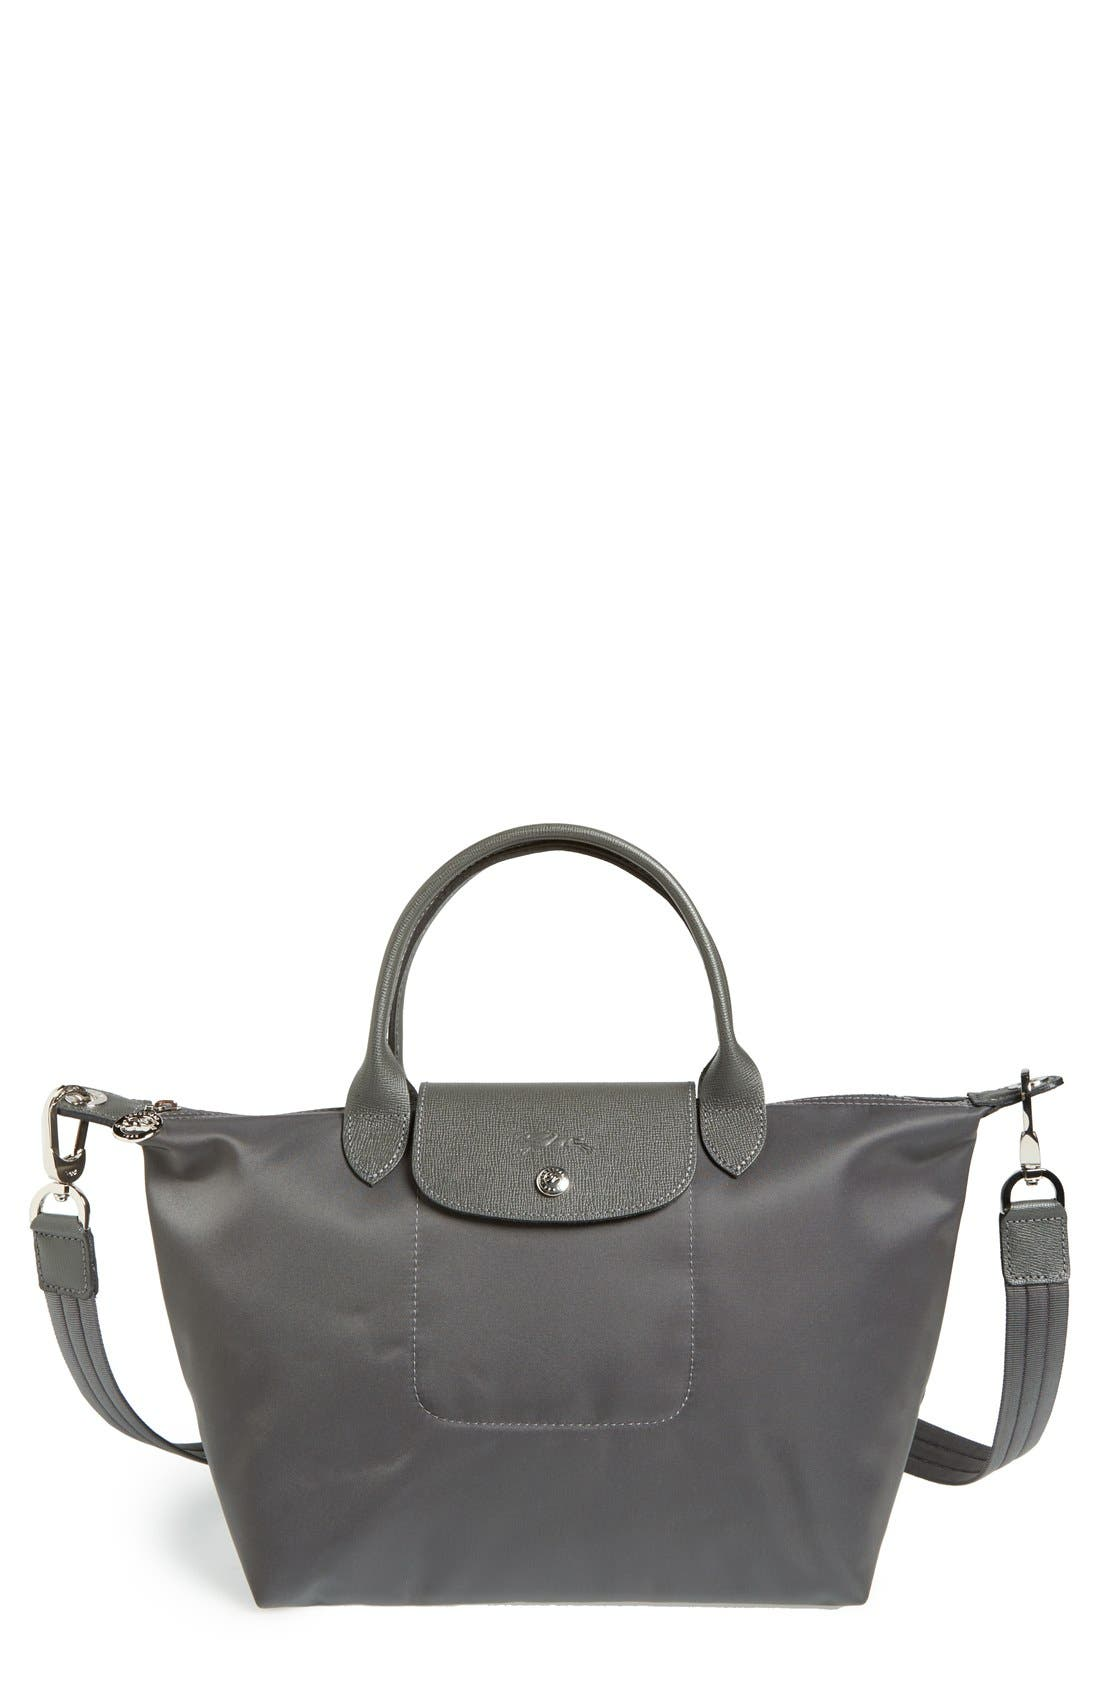 Longchamp 'Small Le Pliage Neo' Nylon Tote